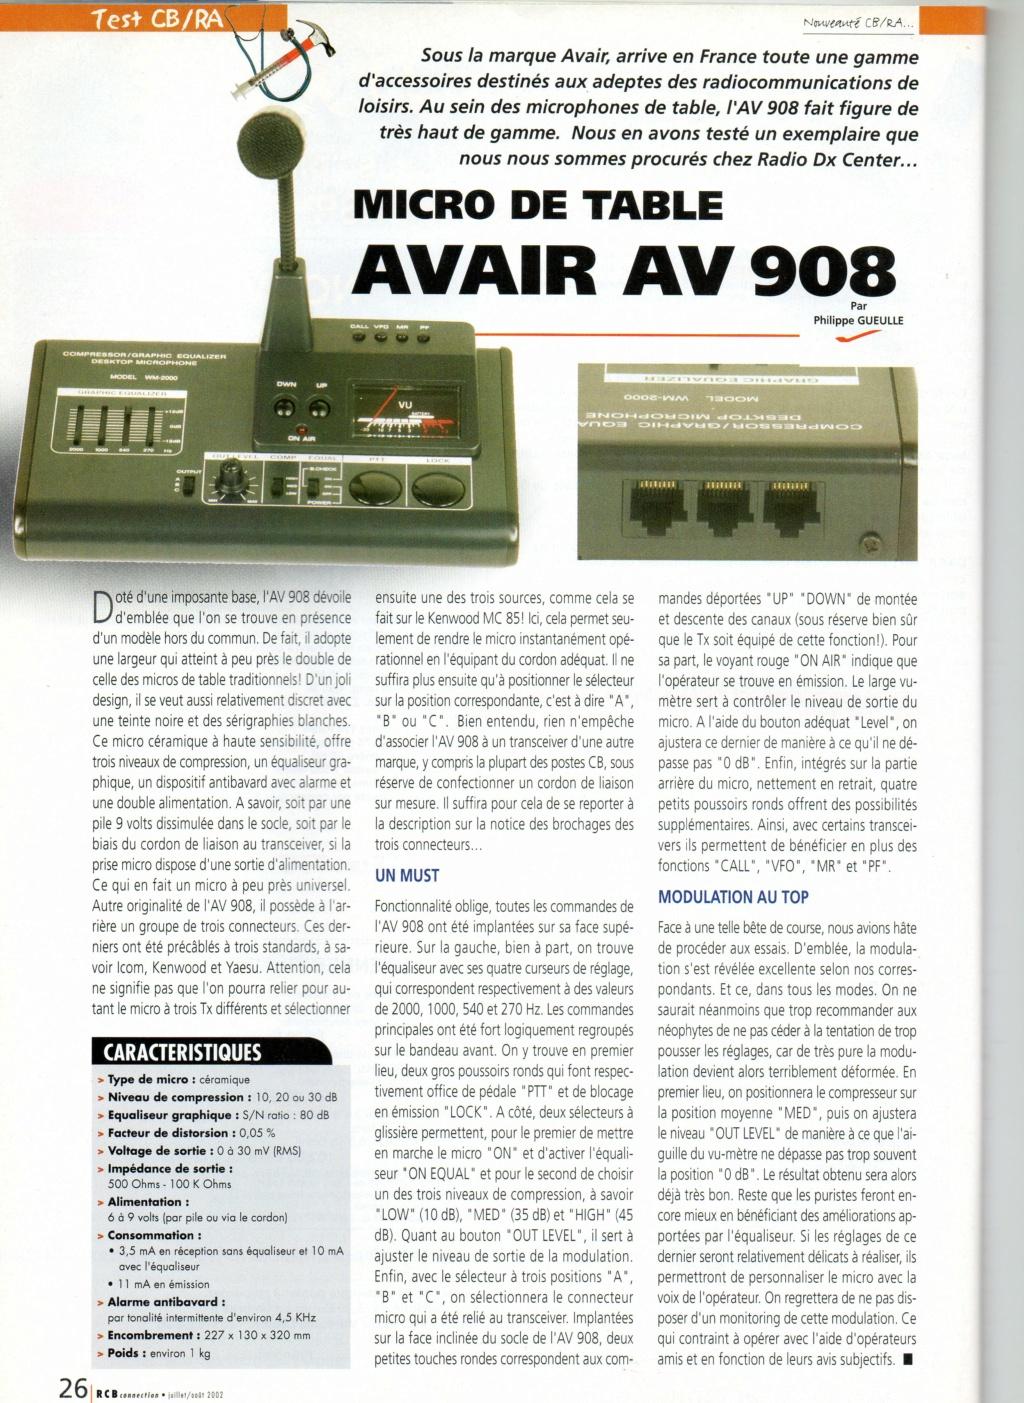 fixe - AV908 (Micro de table avec équalizer) Img34611